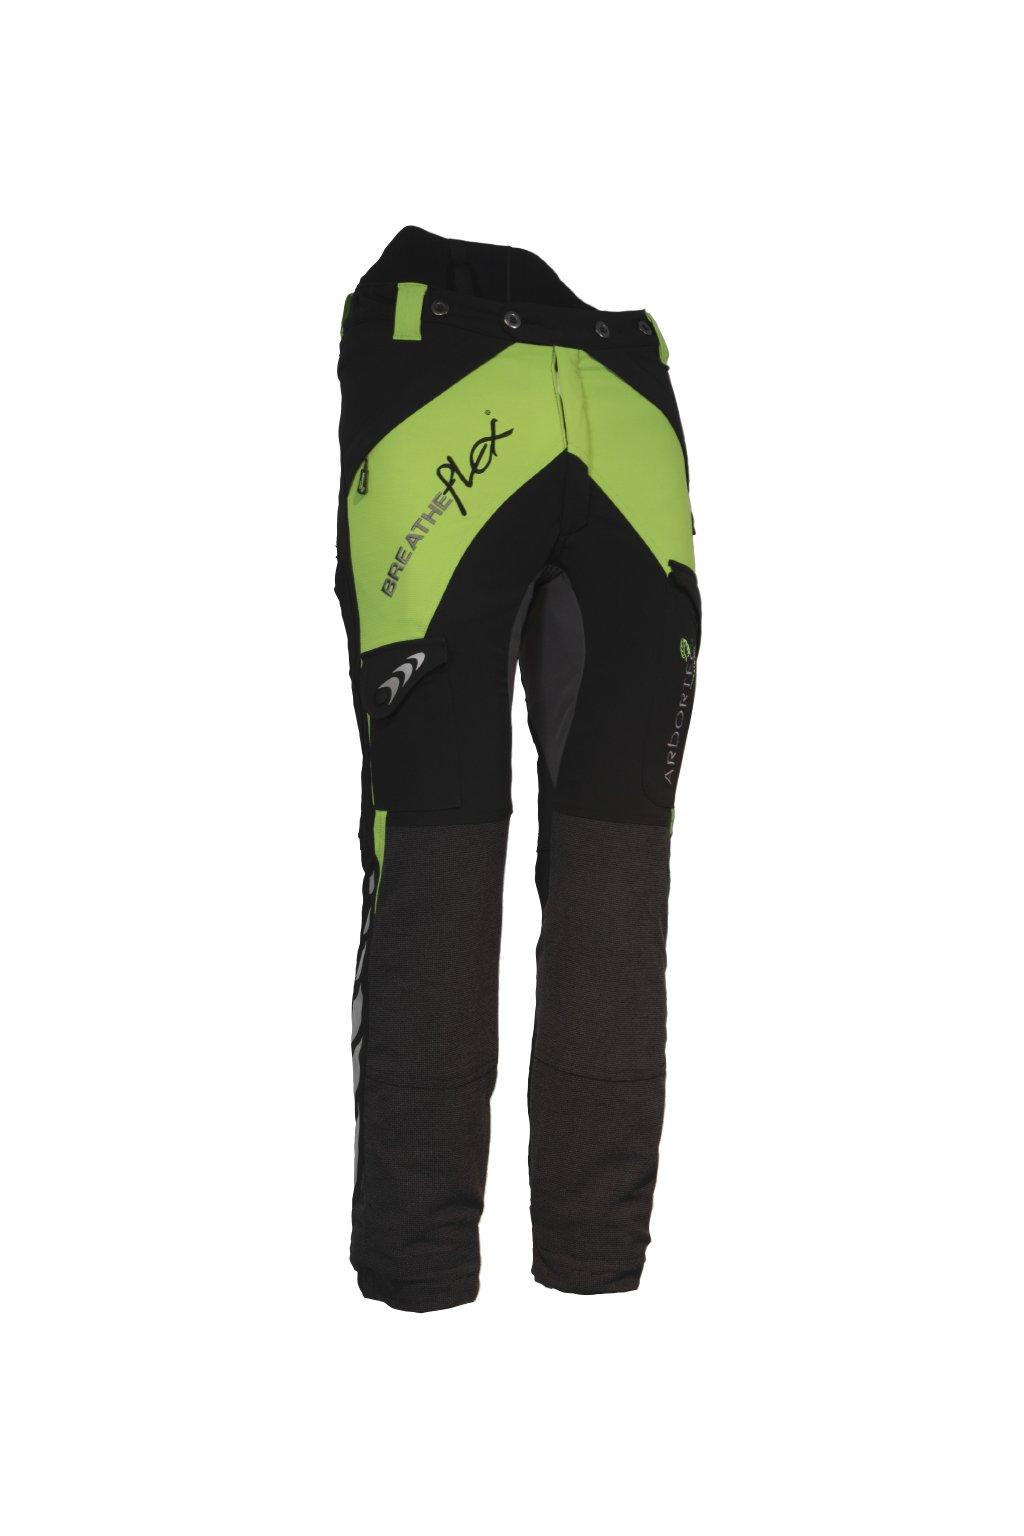 Protipořezové kalhoty Breatheflex zelené Class3/TypeA Reg